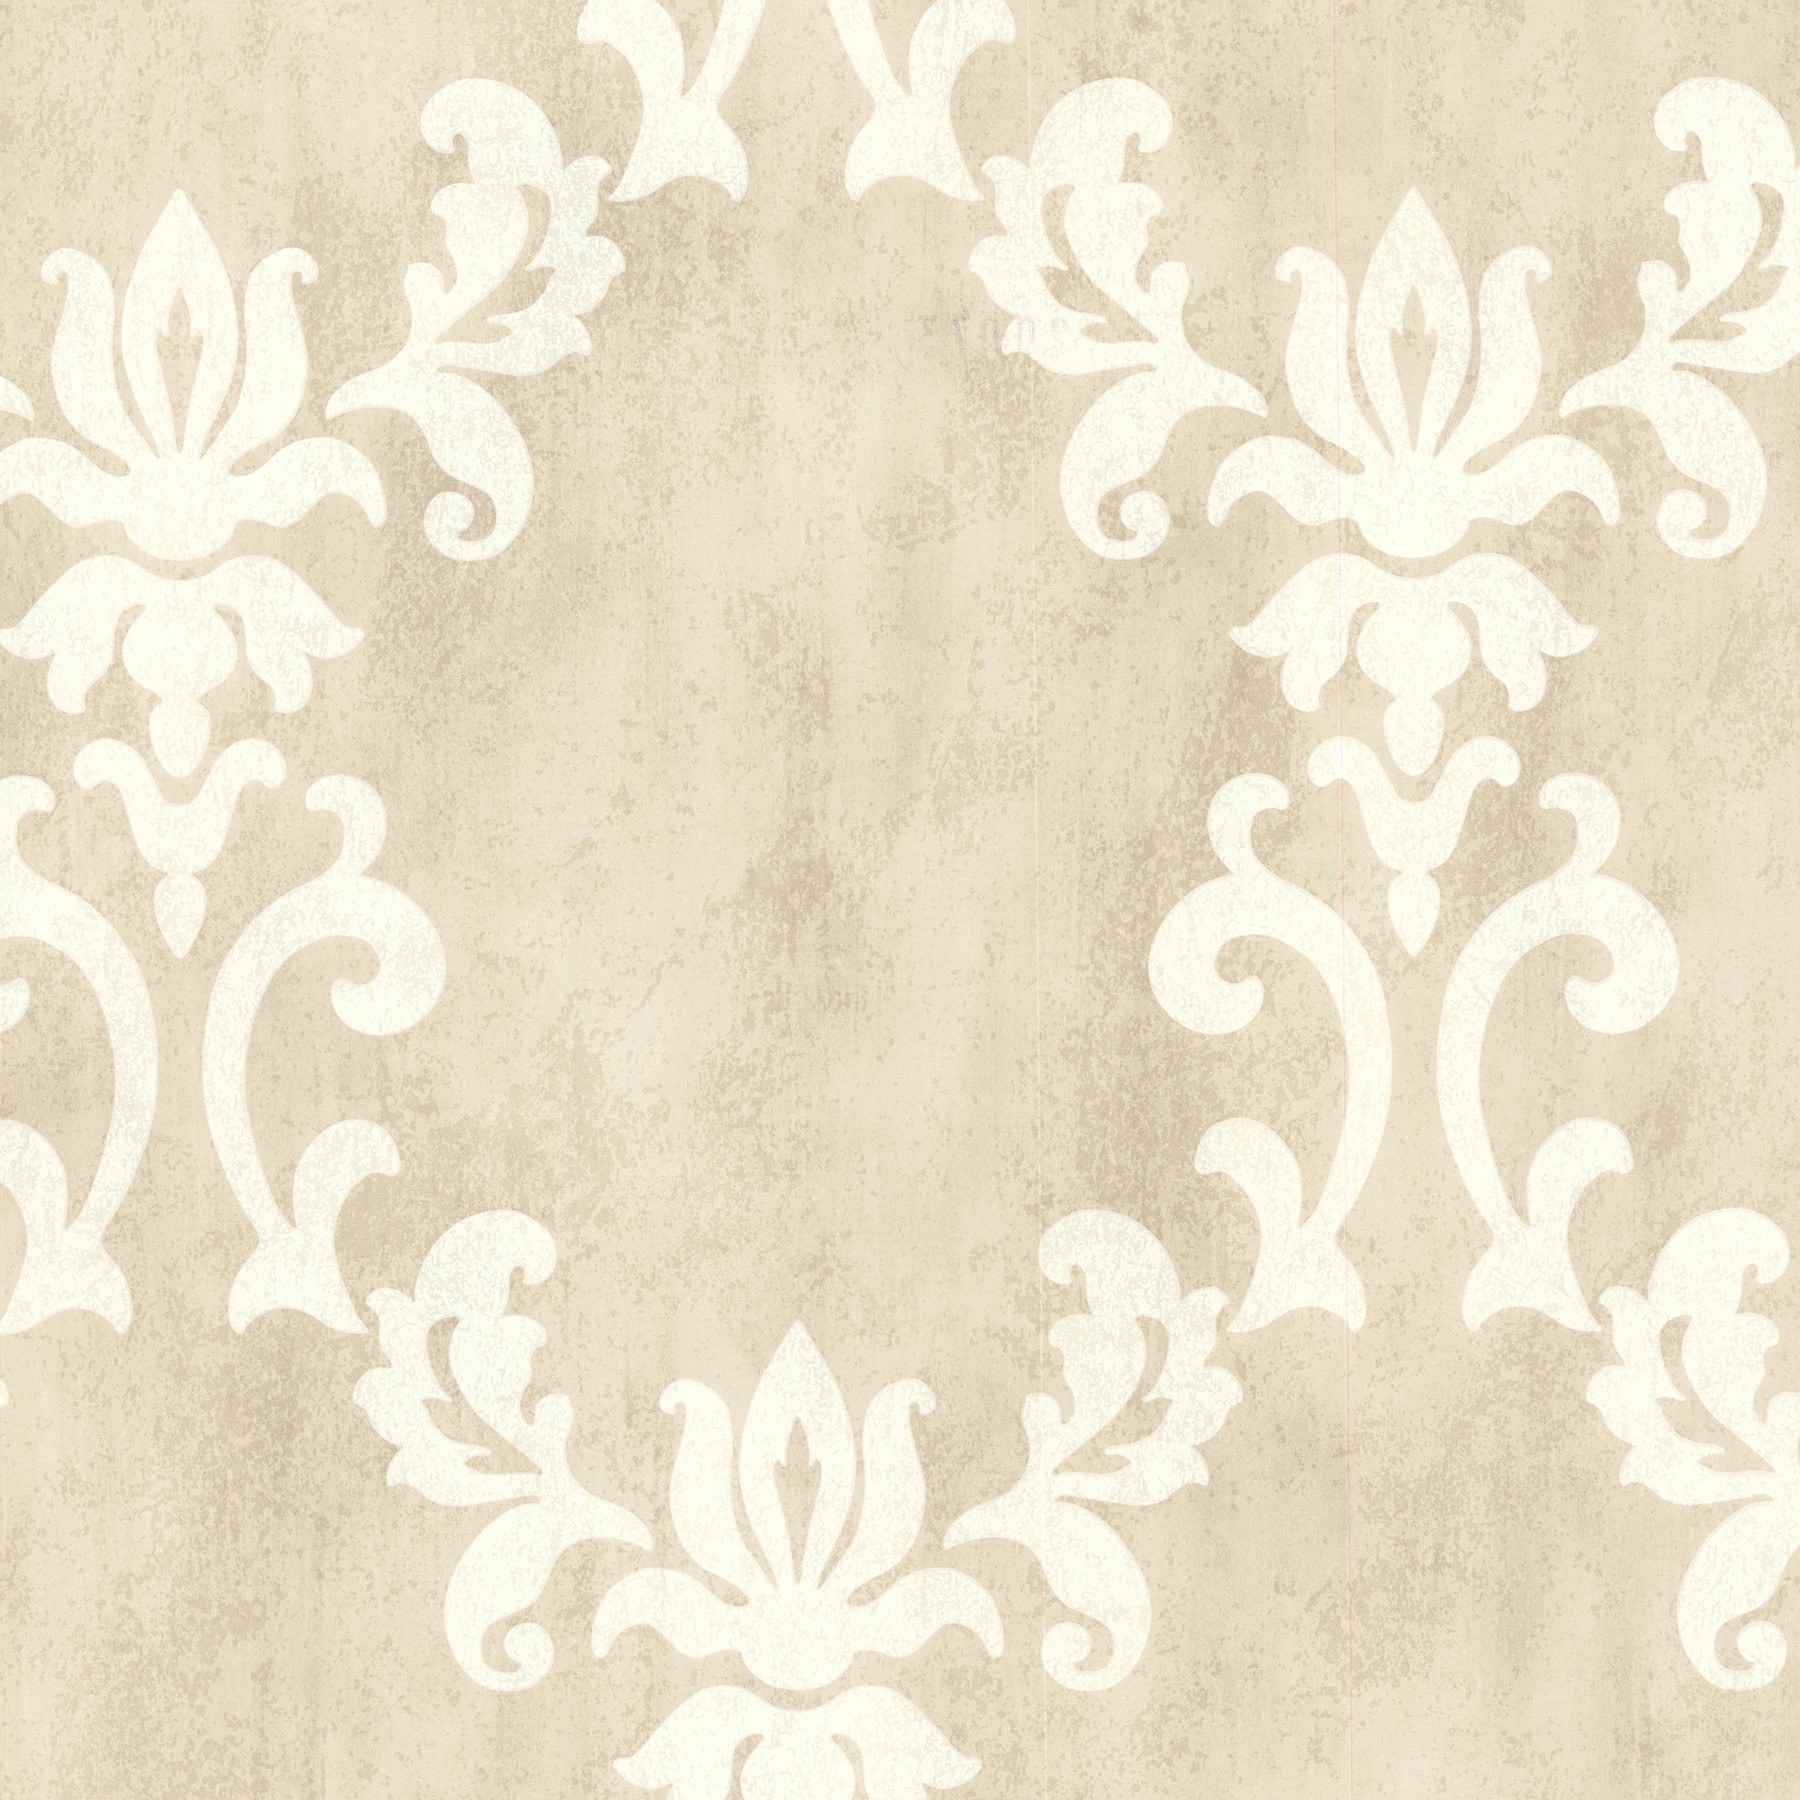 Barock Tapete Auf Leinwand : Tapete Onyx Vliestapete Rasch Textil 020074 Barock beige creme